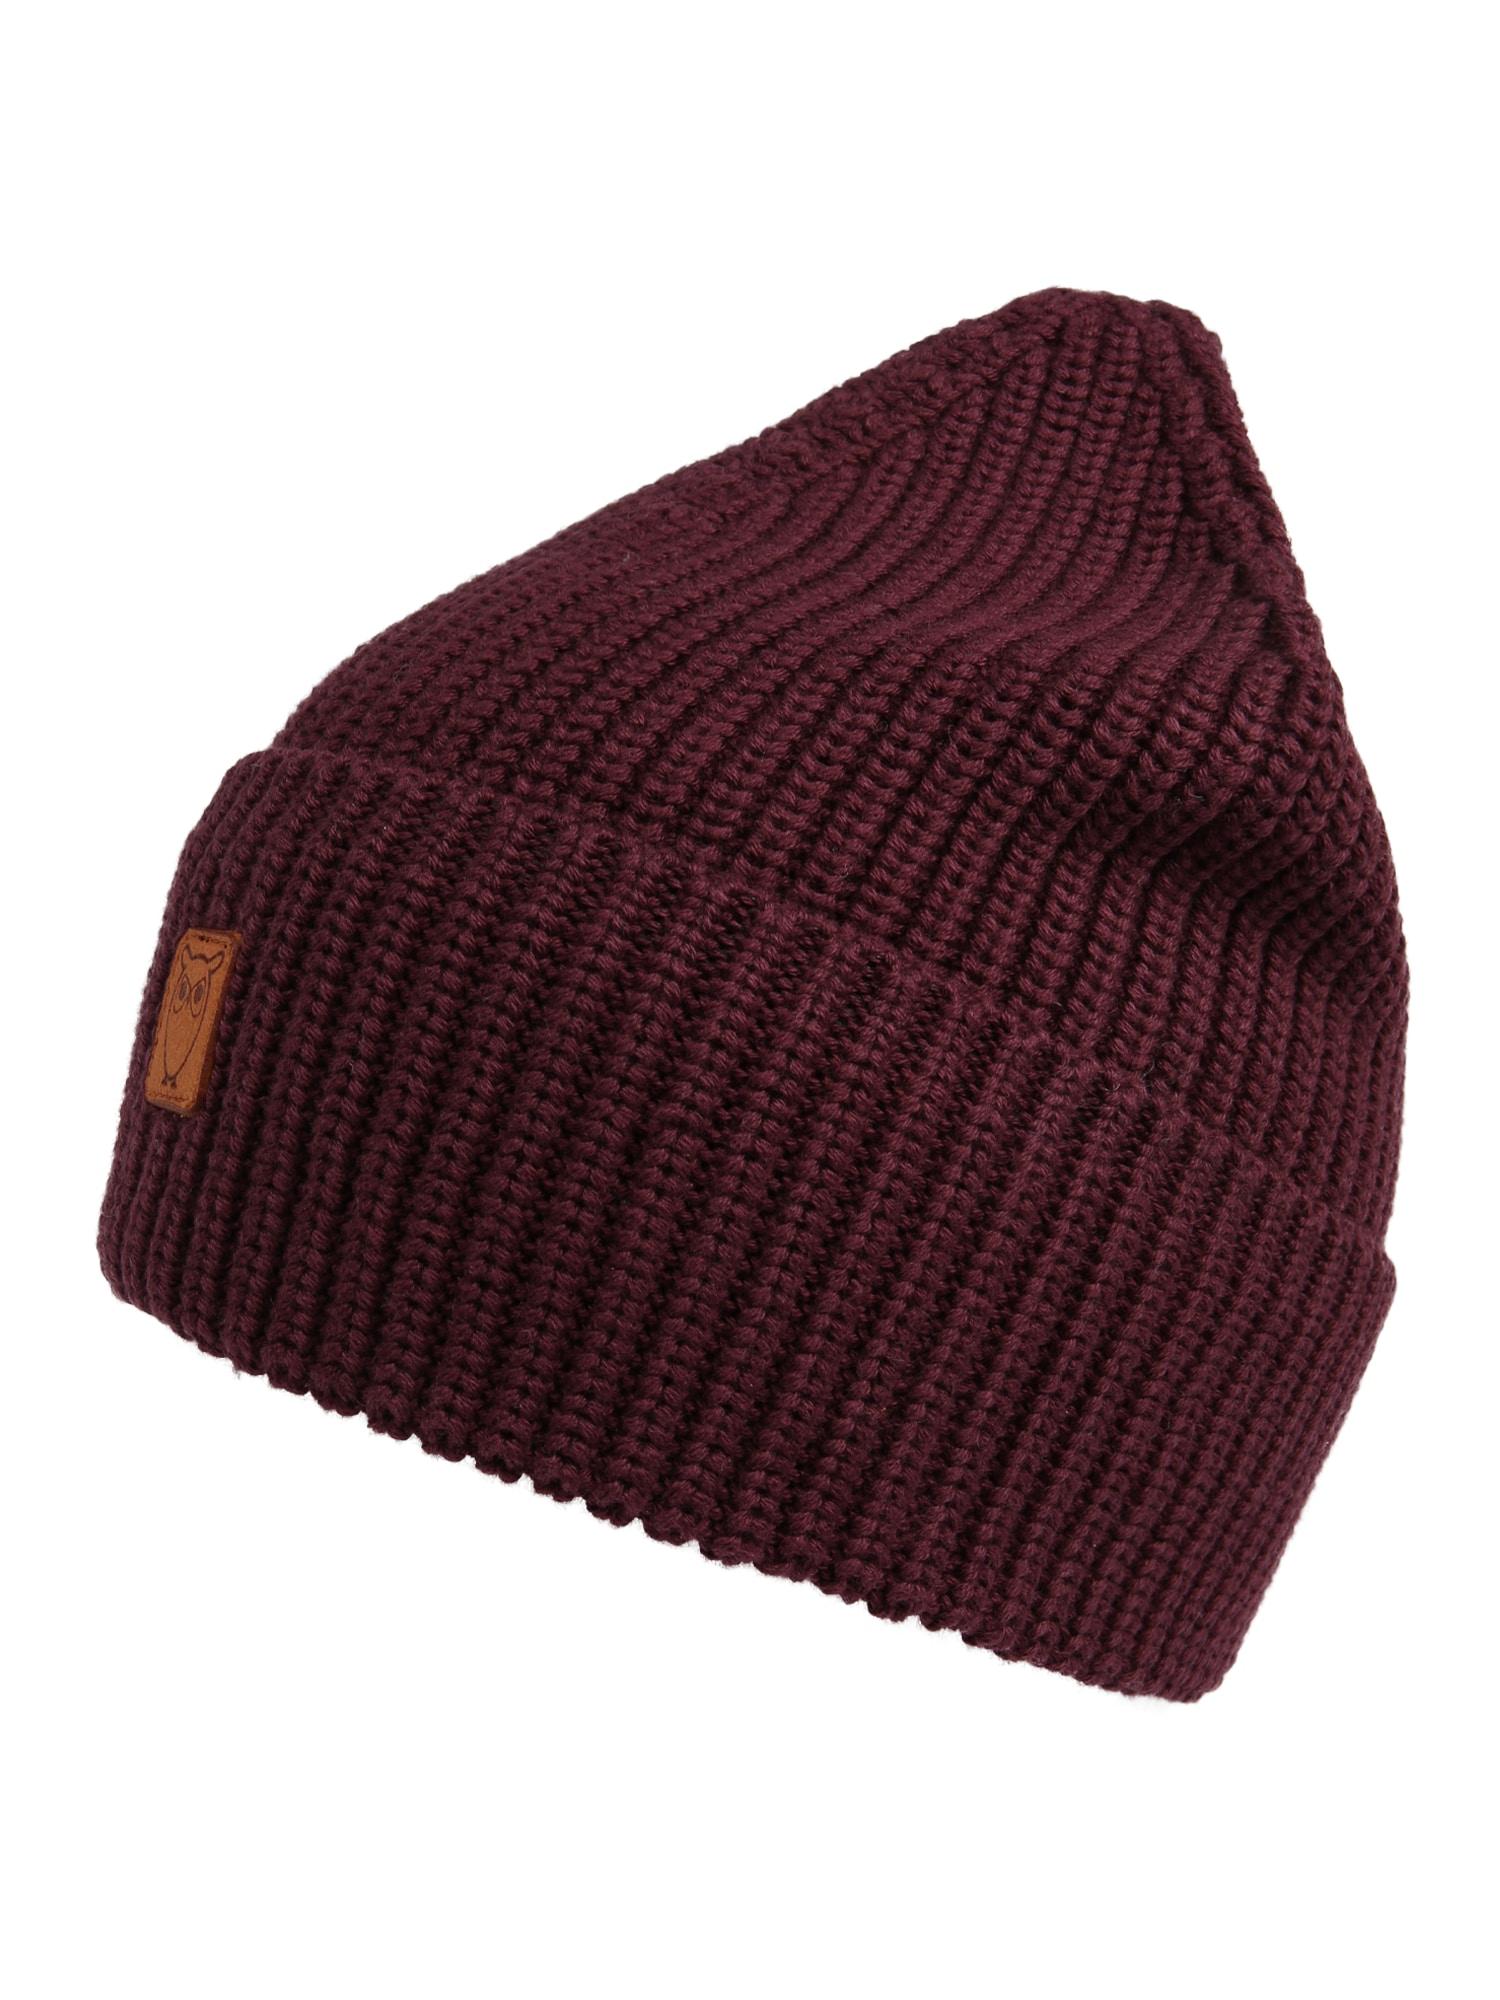 KnowledgeCotton Apparel Megzta kepurė 'Ribbing - GOTS' vyno raudona spalva